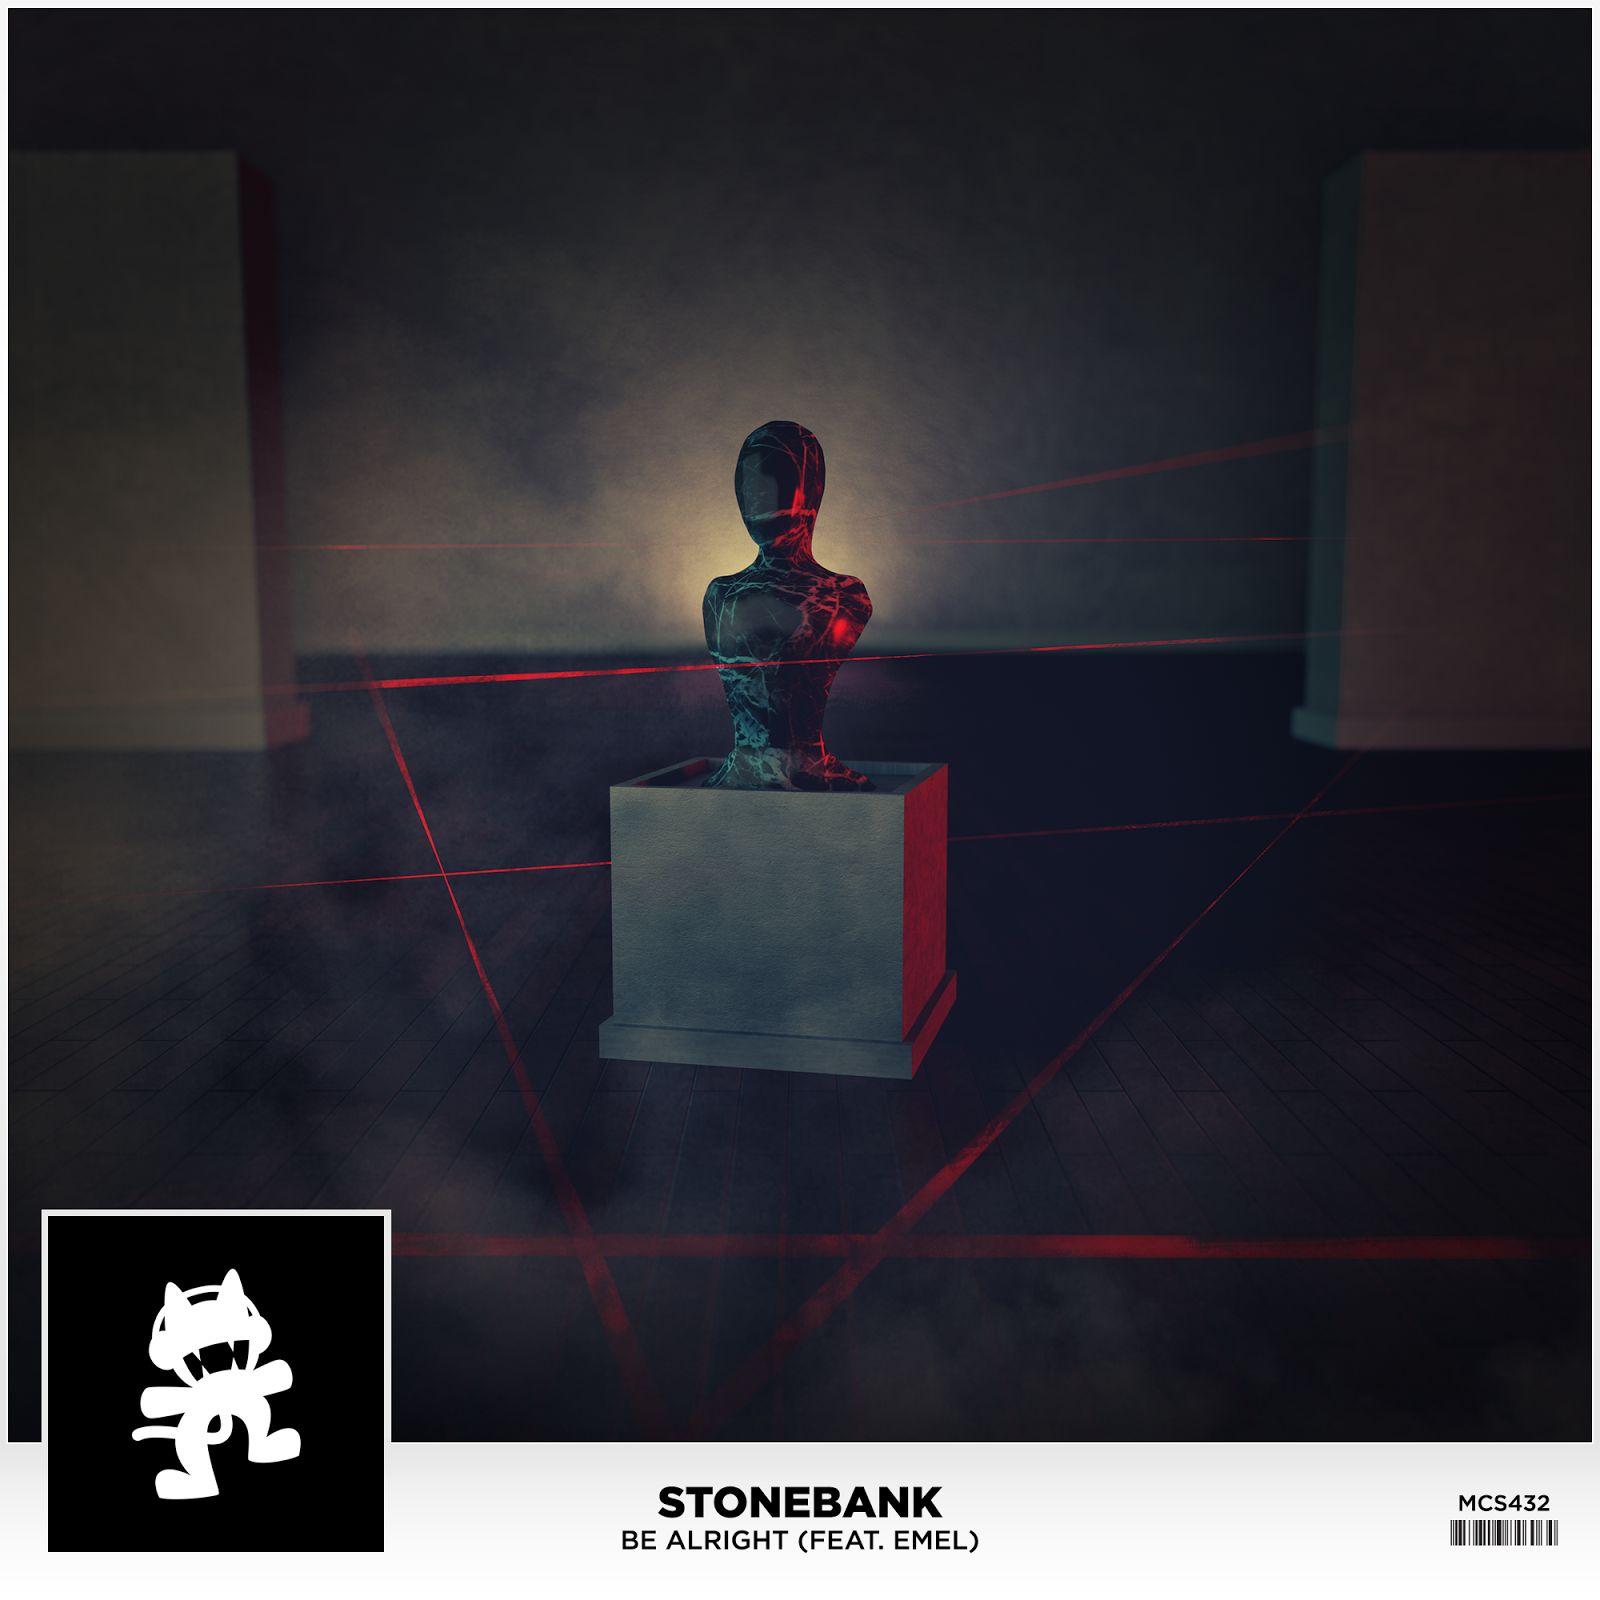 Stonebank - Be Alright (feat. EMEL) (Art)